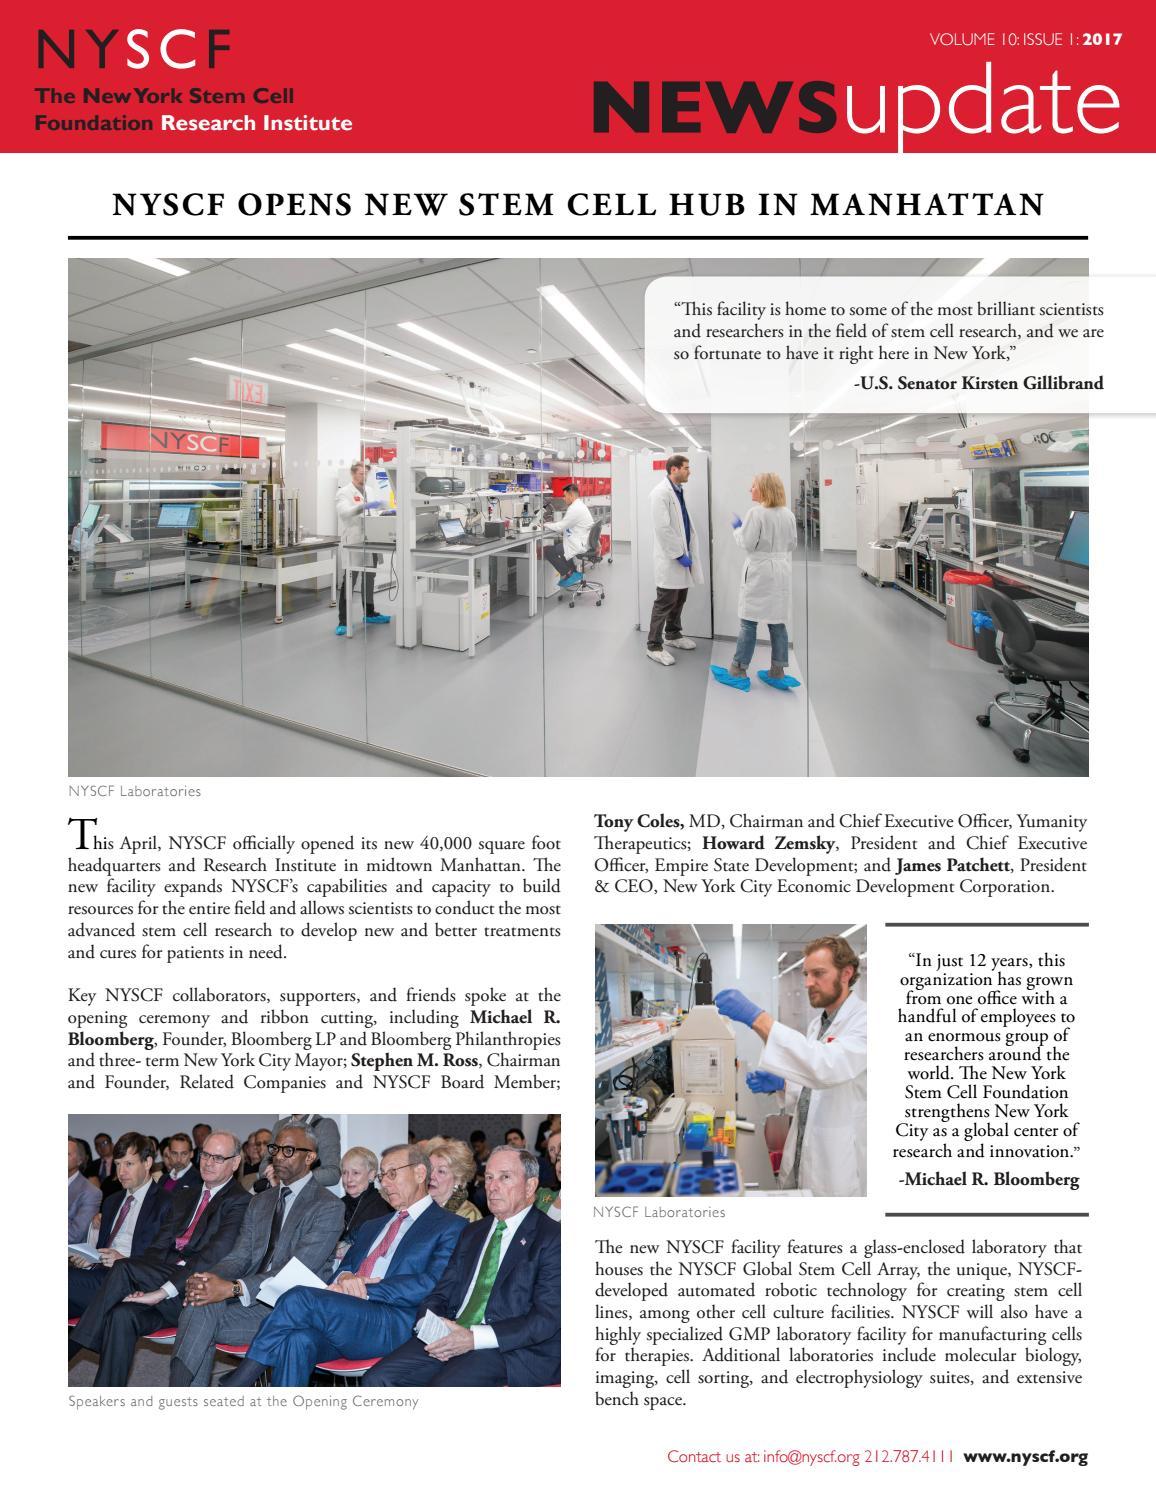 NYSCF News Update | Vol 10, Issue 1